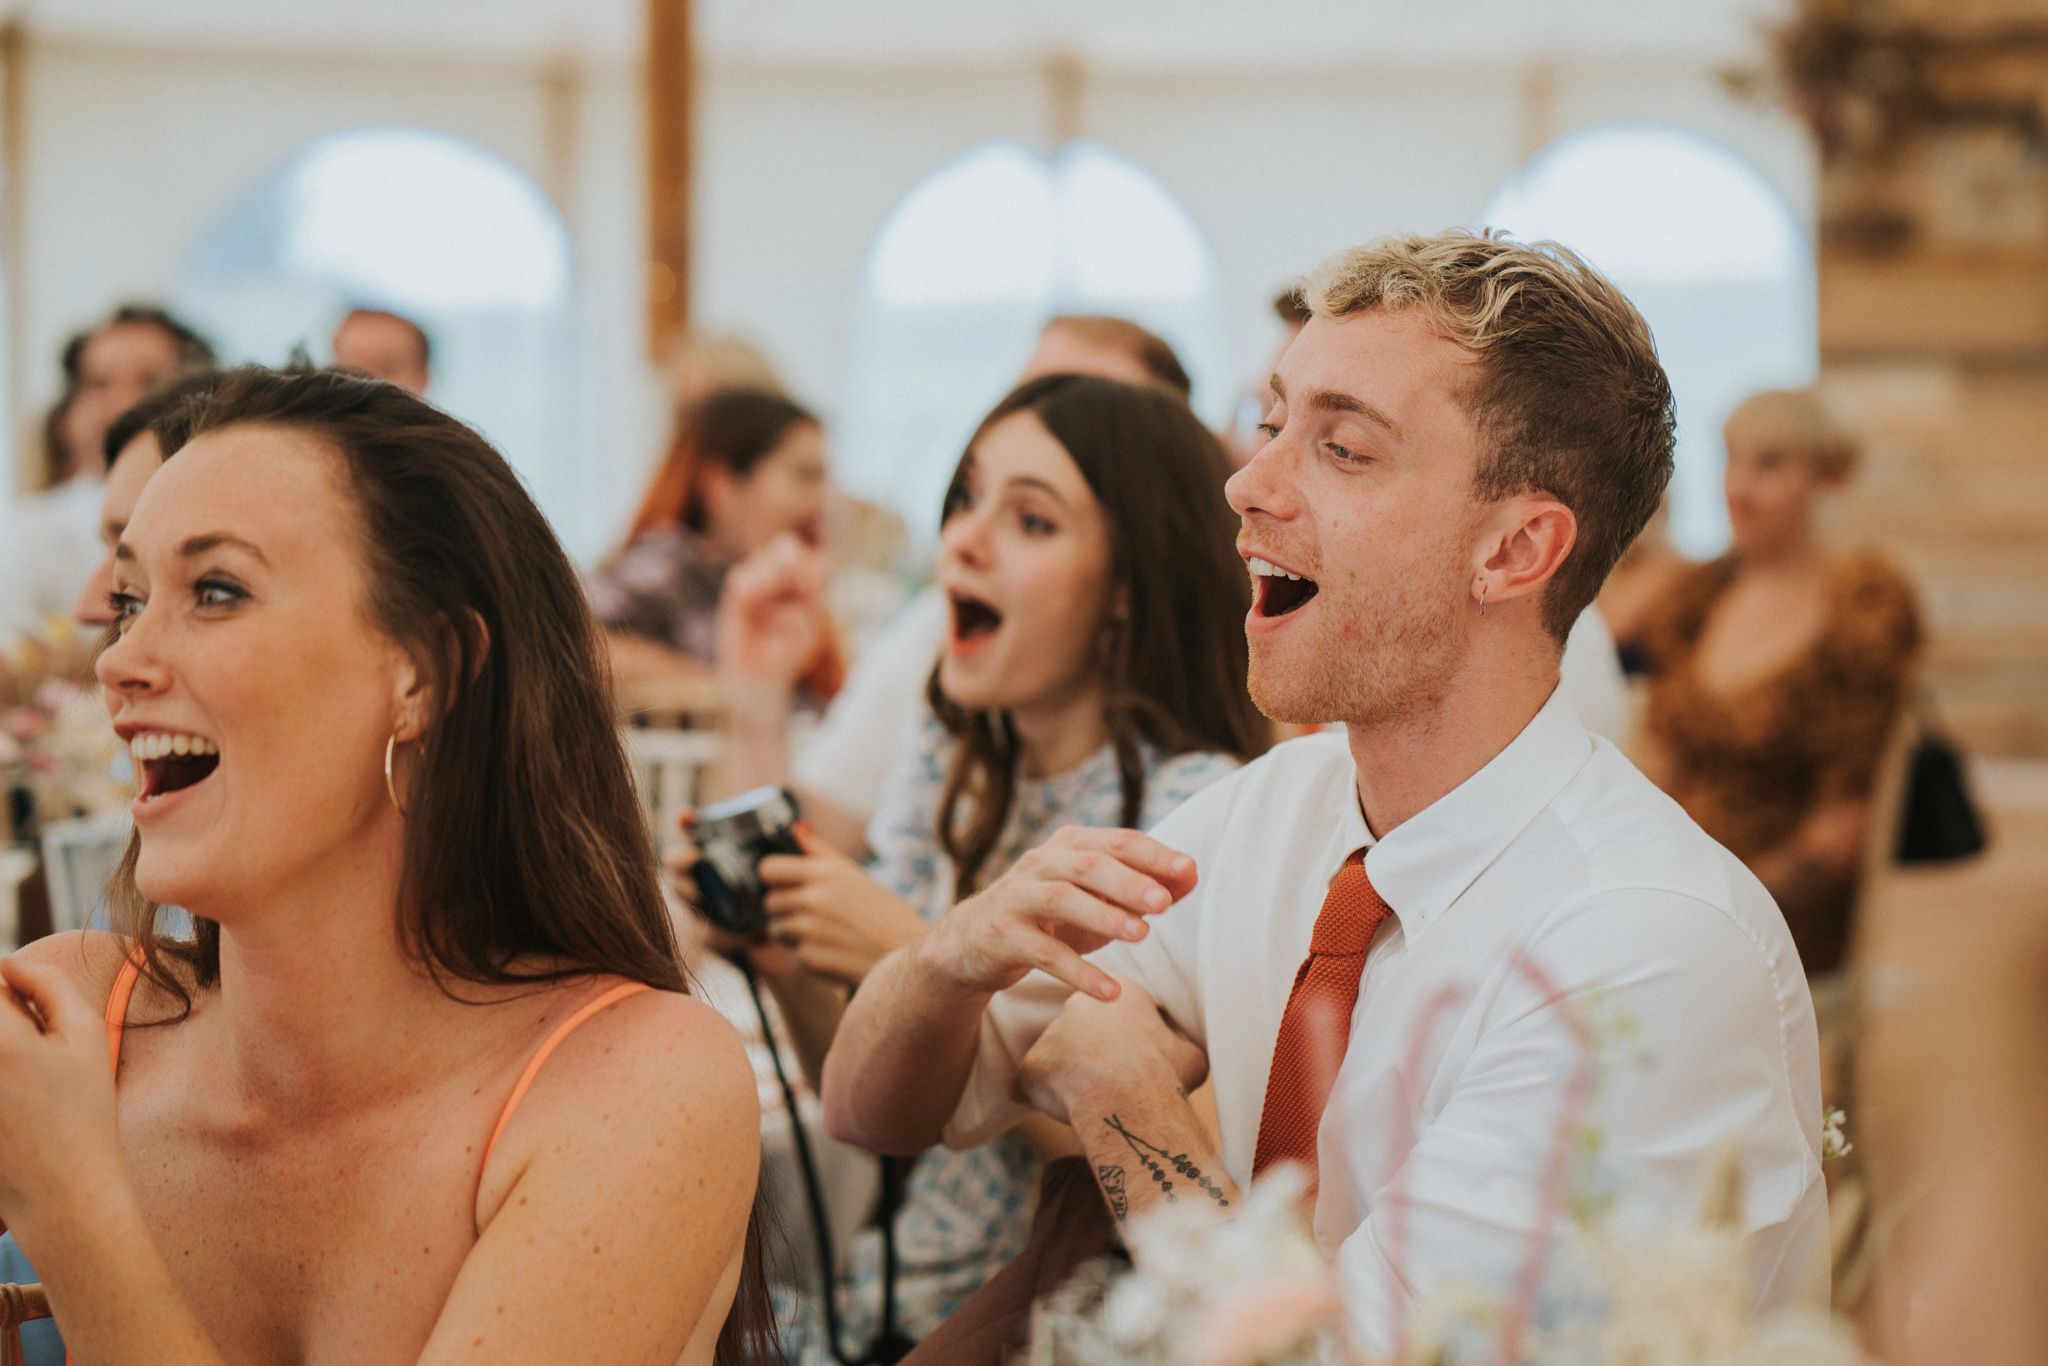 emi-Jack-boho-diy-wedding-eggington-house-grace-elizabeth-colchester-essex-alternative-wedding-photographer-suffolk-norfolk-devon (36 of 56).jpg